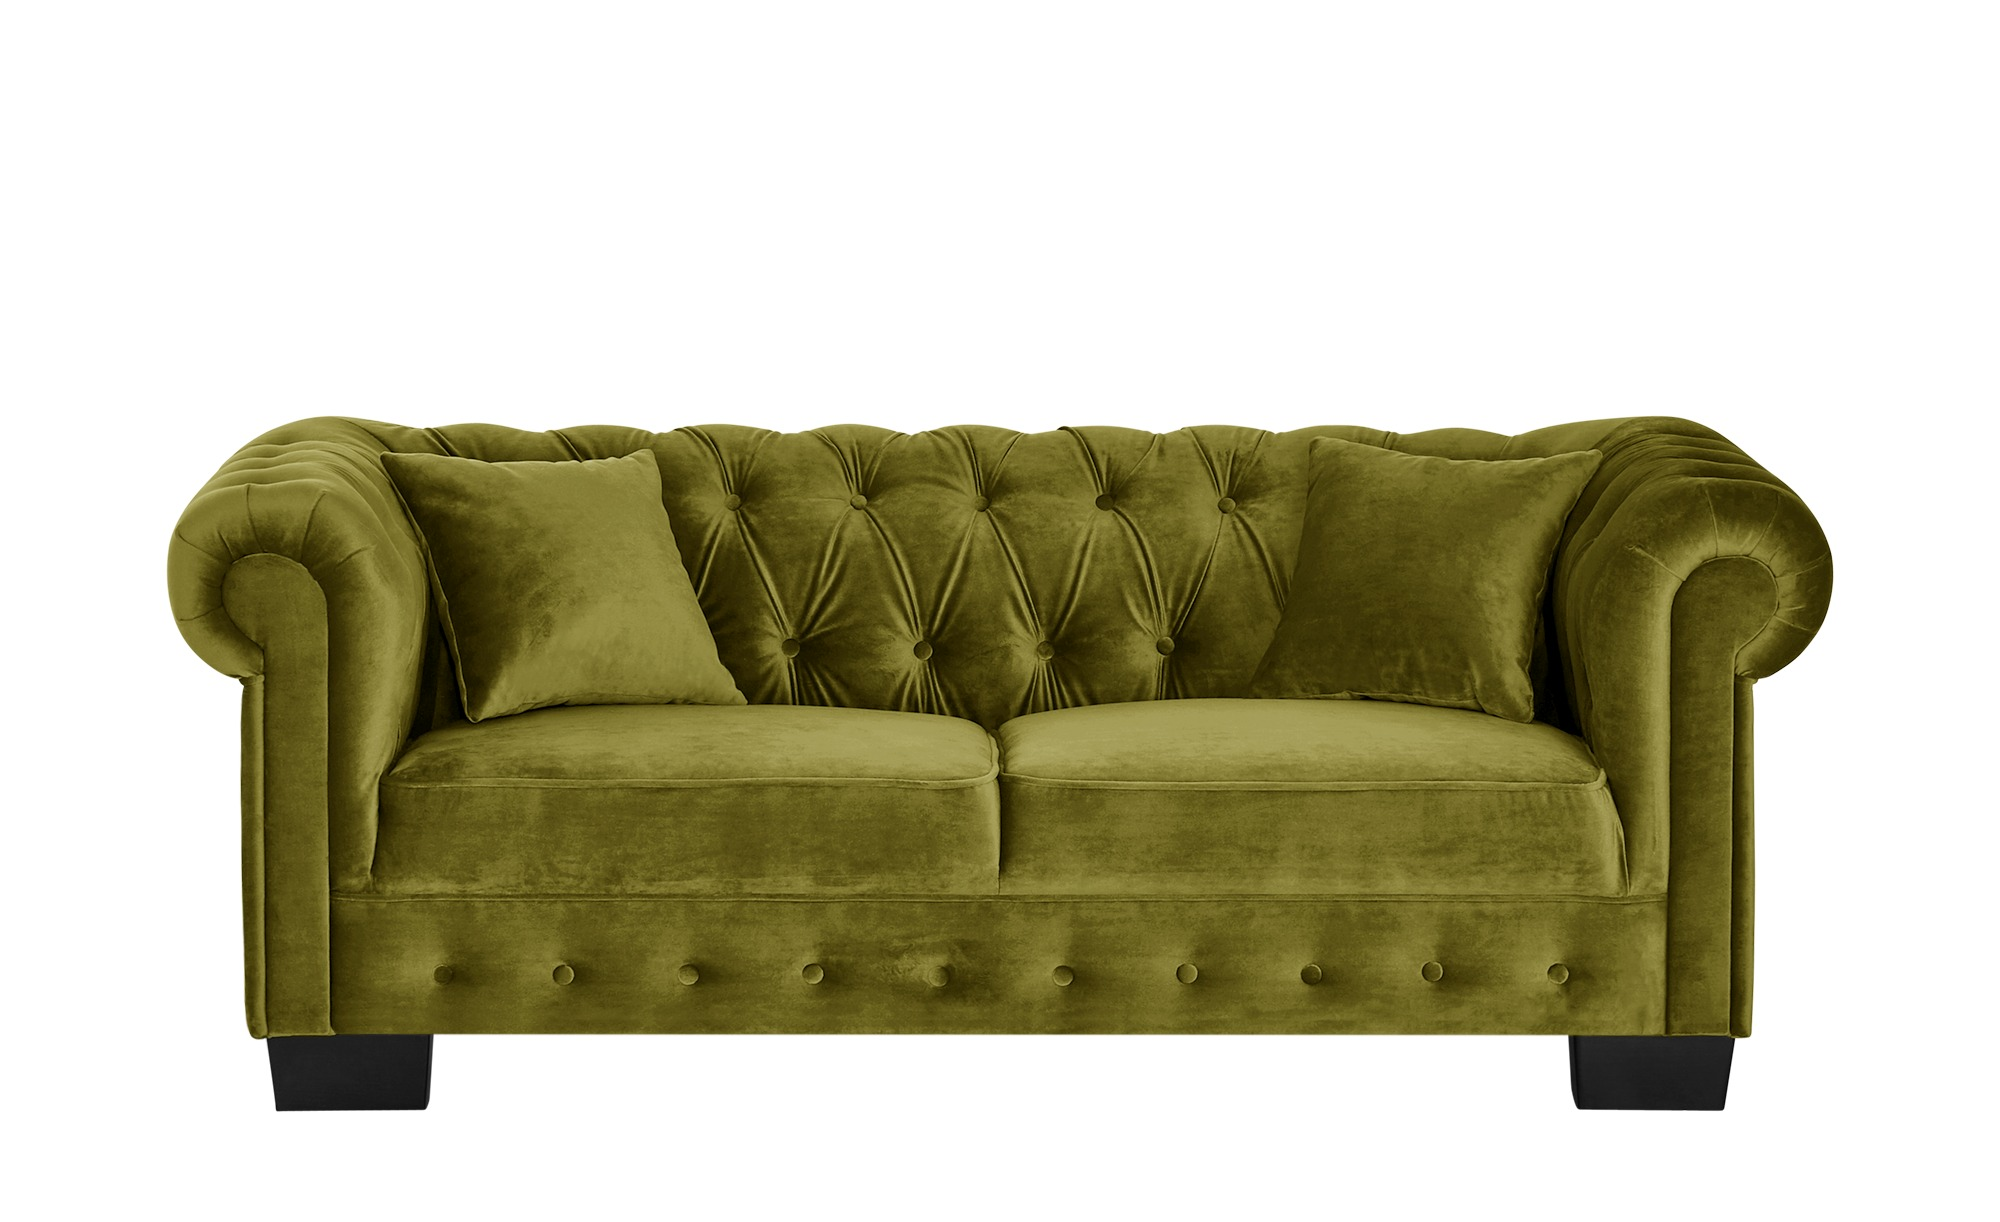 smart Sofa grün - Velour Chelli ¦ grün ¦ Maße (cm): B: 206 H: 77 T: 96 Polstermöbel > Sofas > 3-Sitzer - Höffner